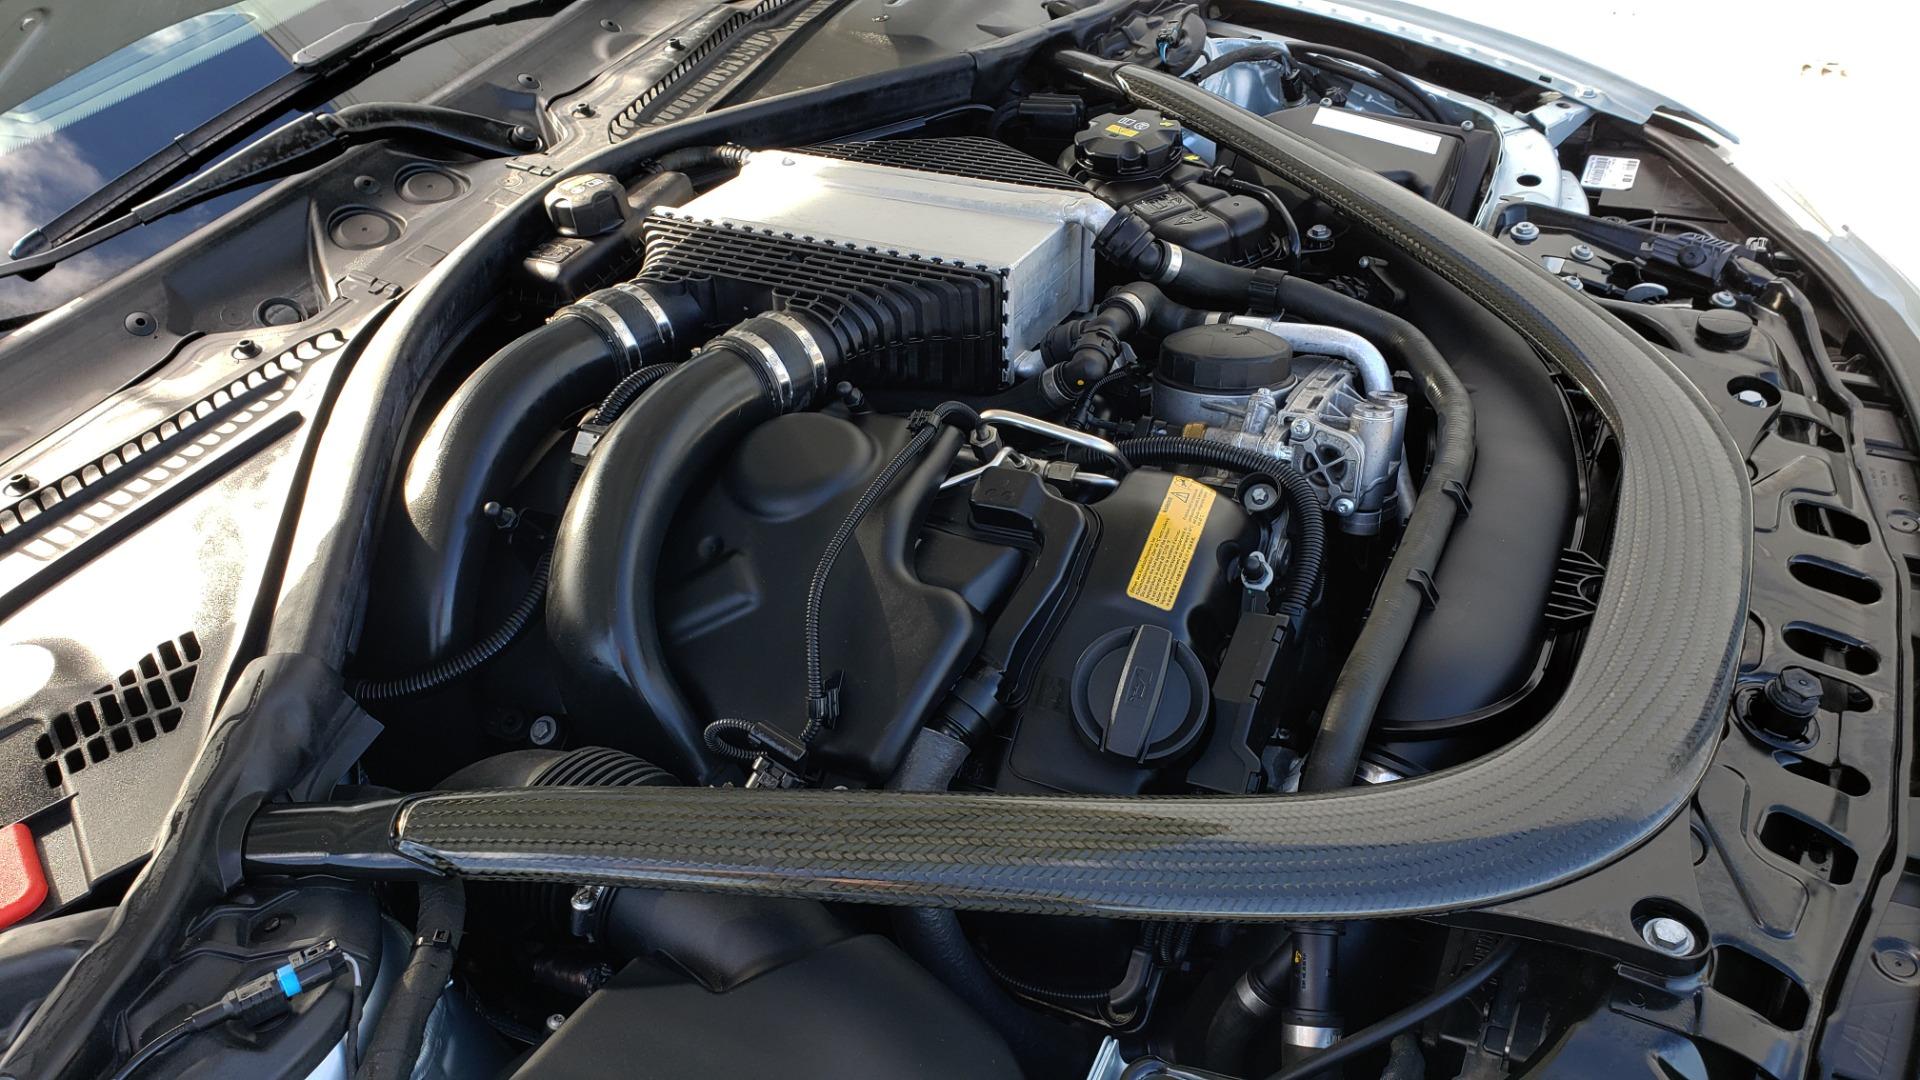 Used 2015 BMW M4 COUPE / EXEC PKG / DRVR ASST PLUS / LIGHTING / M-SUSPENSION for sale Sold at Formula Imports in Charlotte NC 28227 16